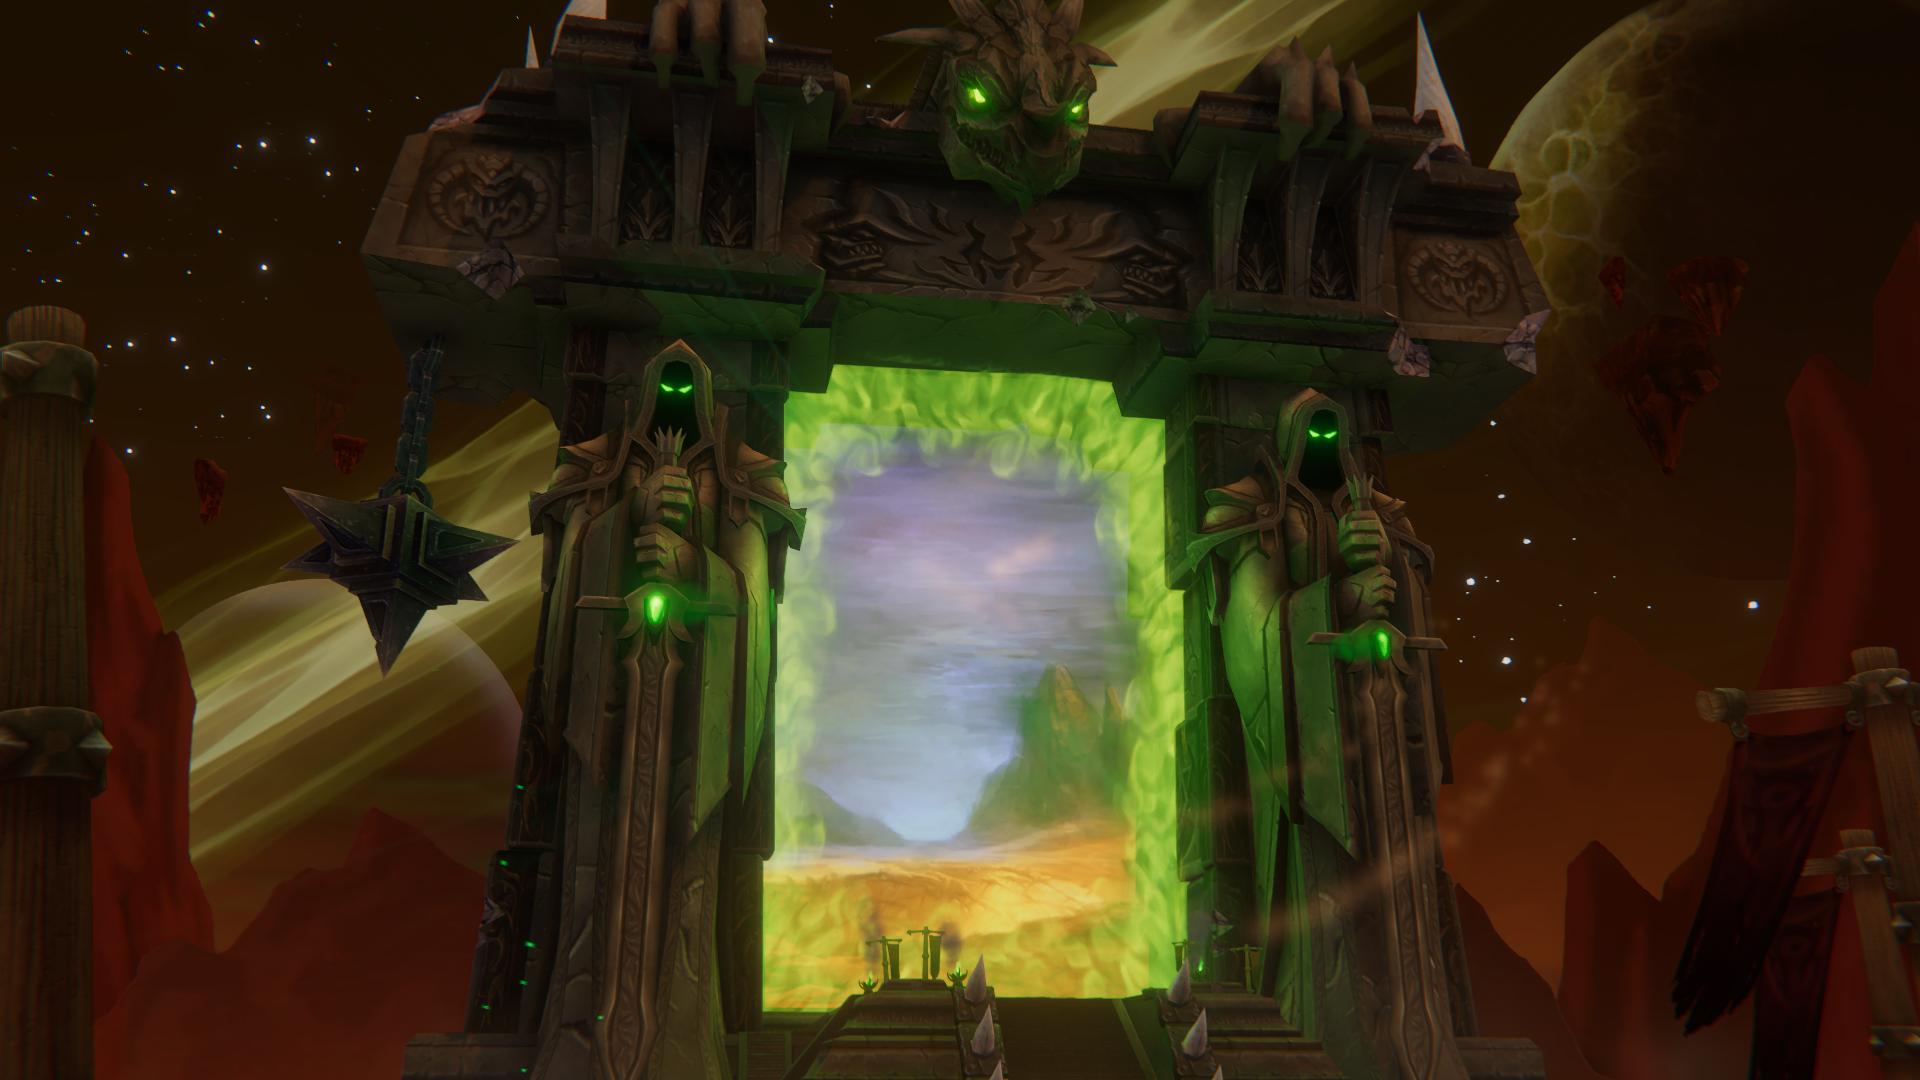 World Of Warcraft The Dark Portal Uhd 4k Wallpaper: Portal To Enchanted World HD Wallpaper